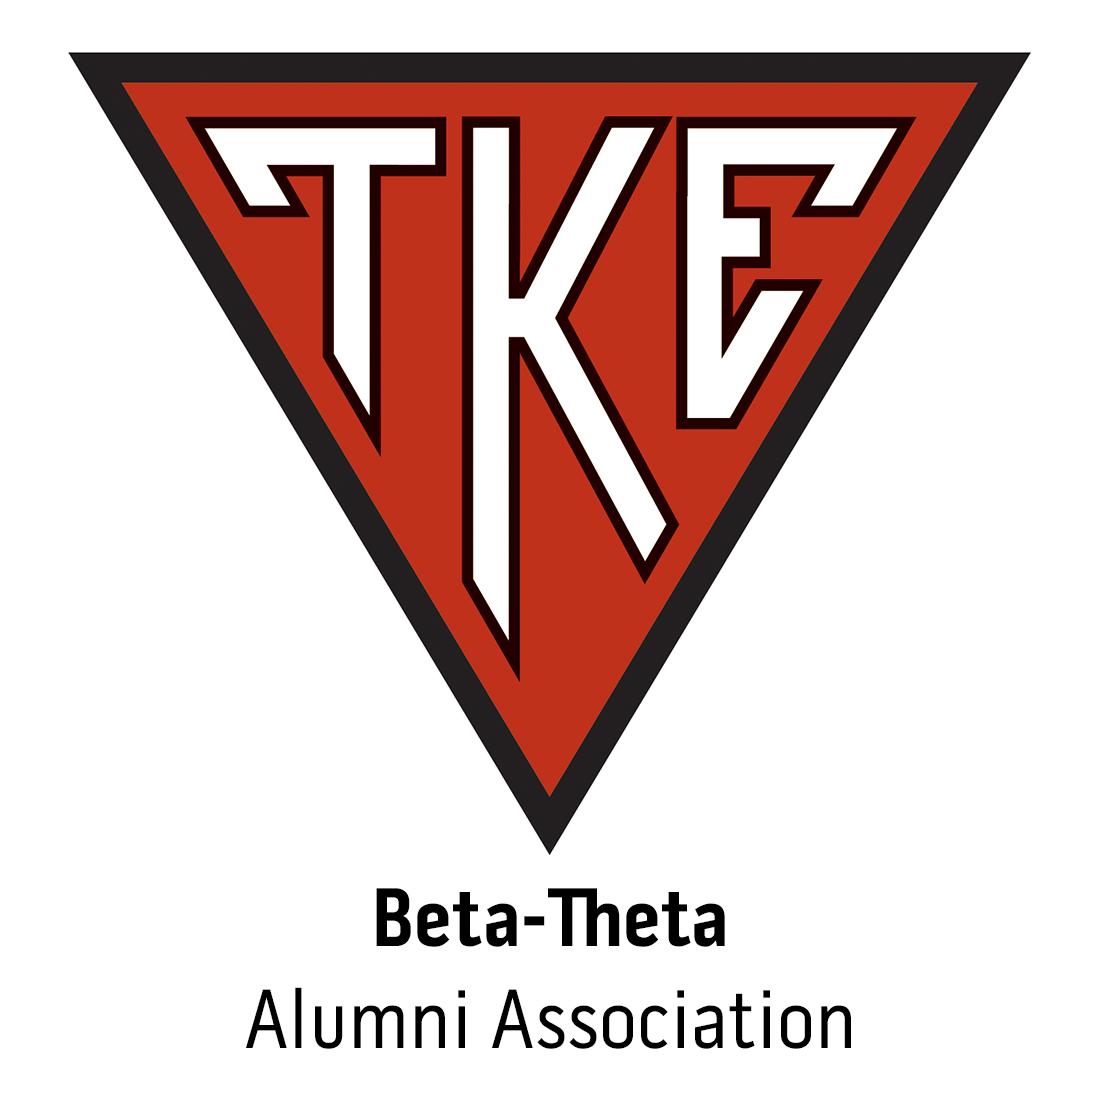 Beta-Theta Alumni Association for University of Missouri-Columbia